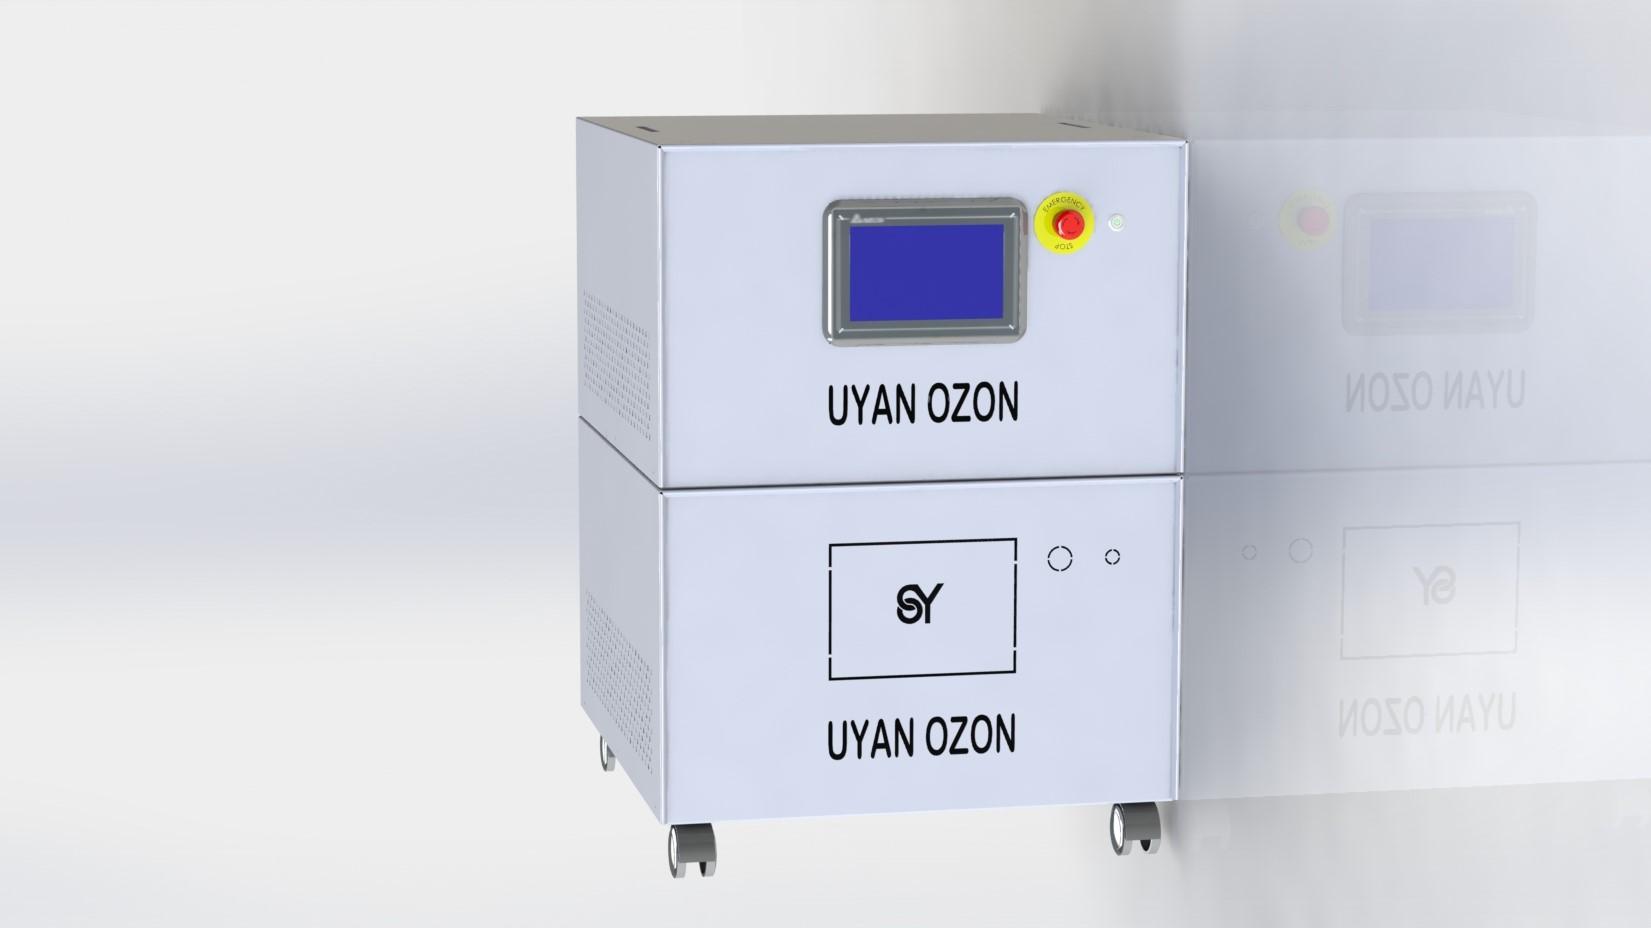 SY-OZYN-20D ÇİFTLİ ALTTA DAHİLİ OKSİJEN ÜSTTE OZON 20 GR OZON CİHAZI